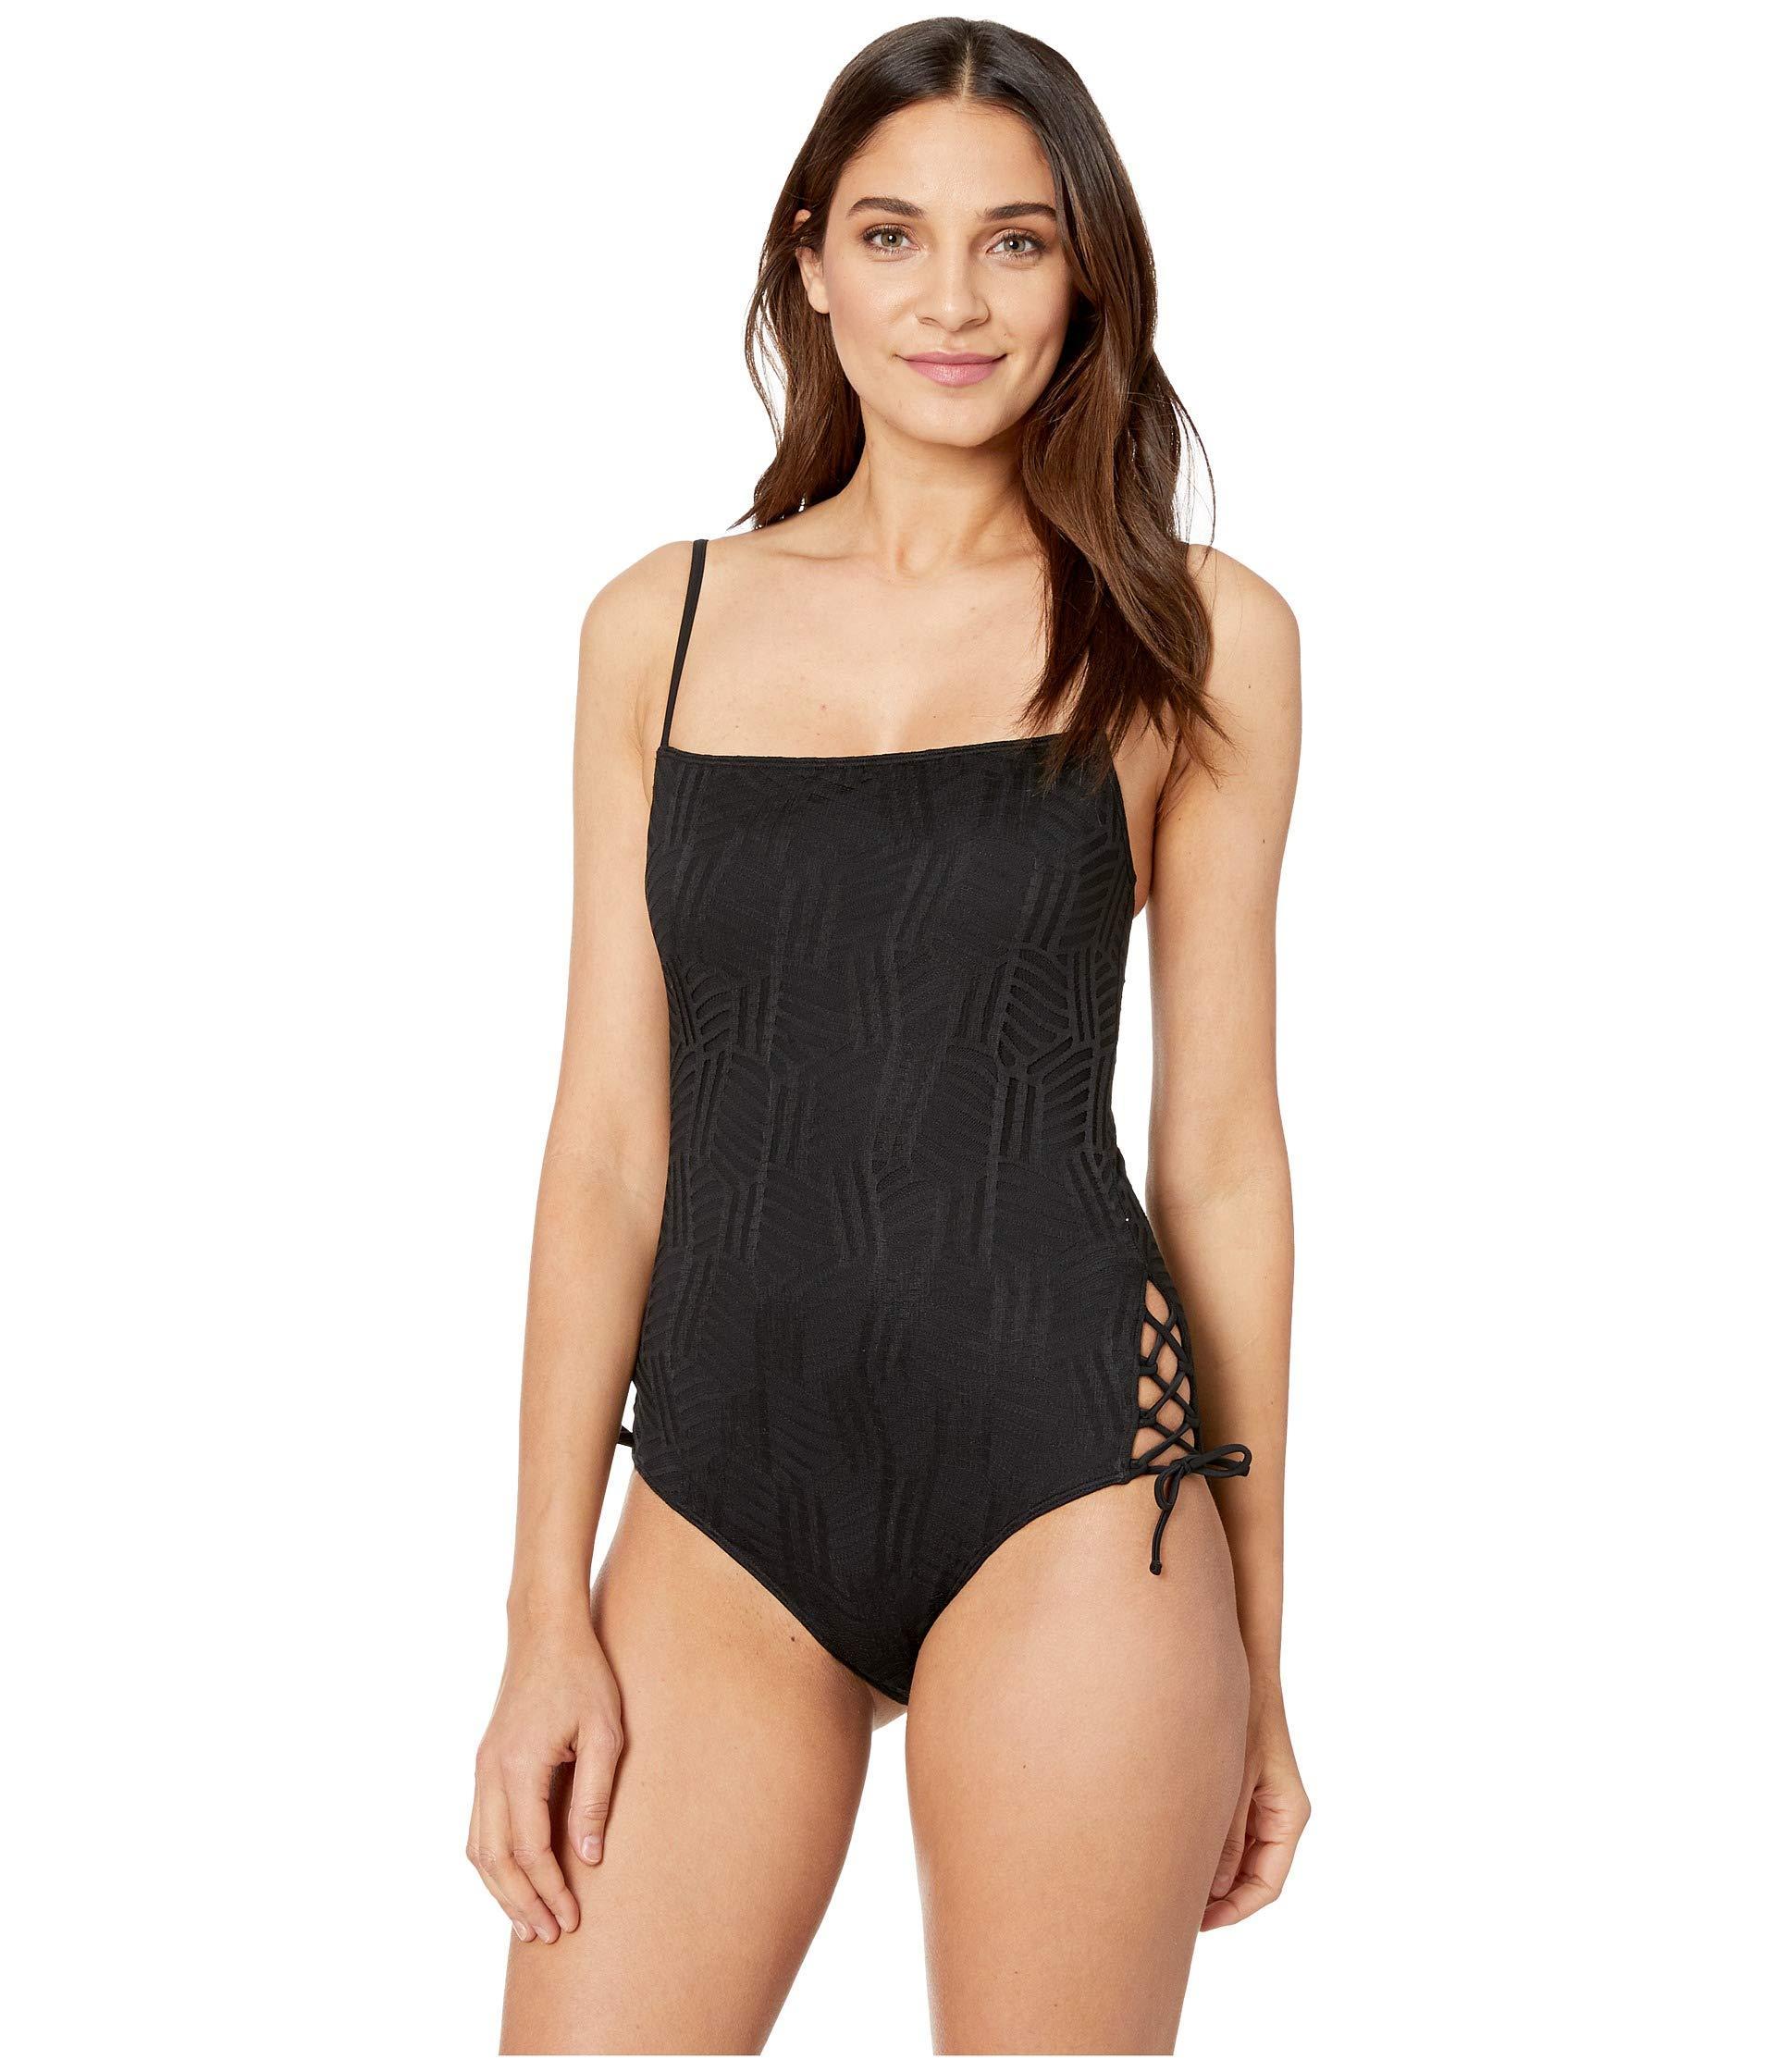 4fedc2bd54dce Lyst - Roxy Island Of Gods One-piece Swimsuit in Black - Save 51%